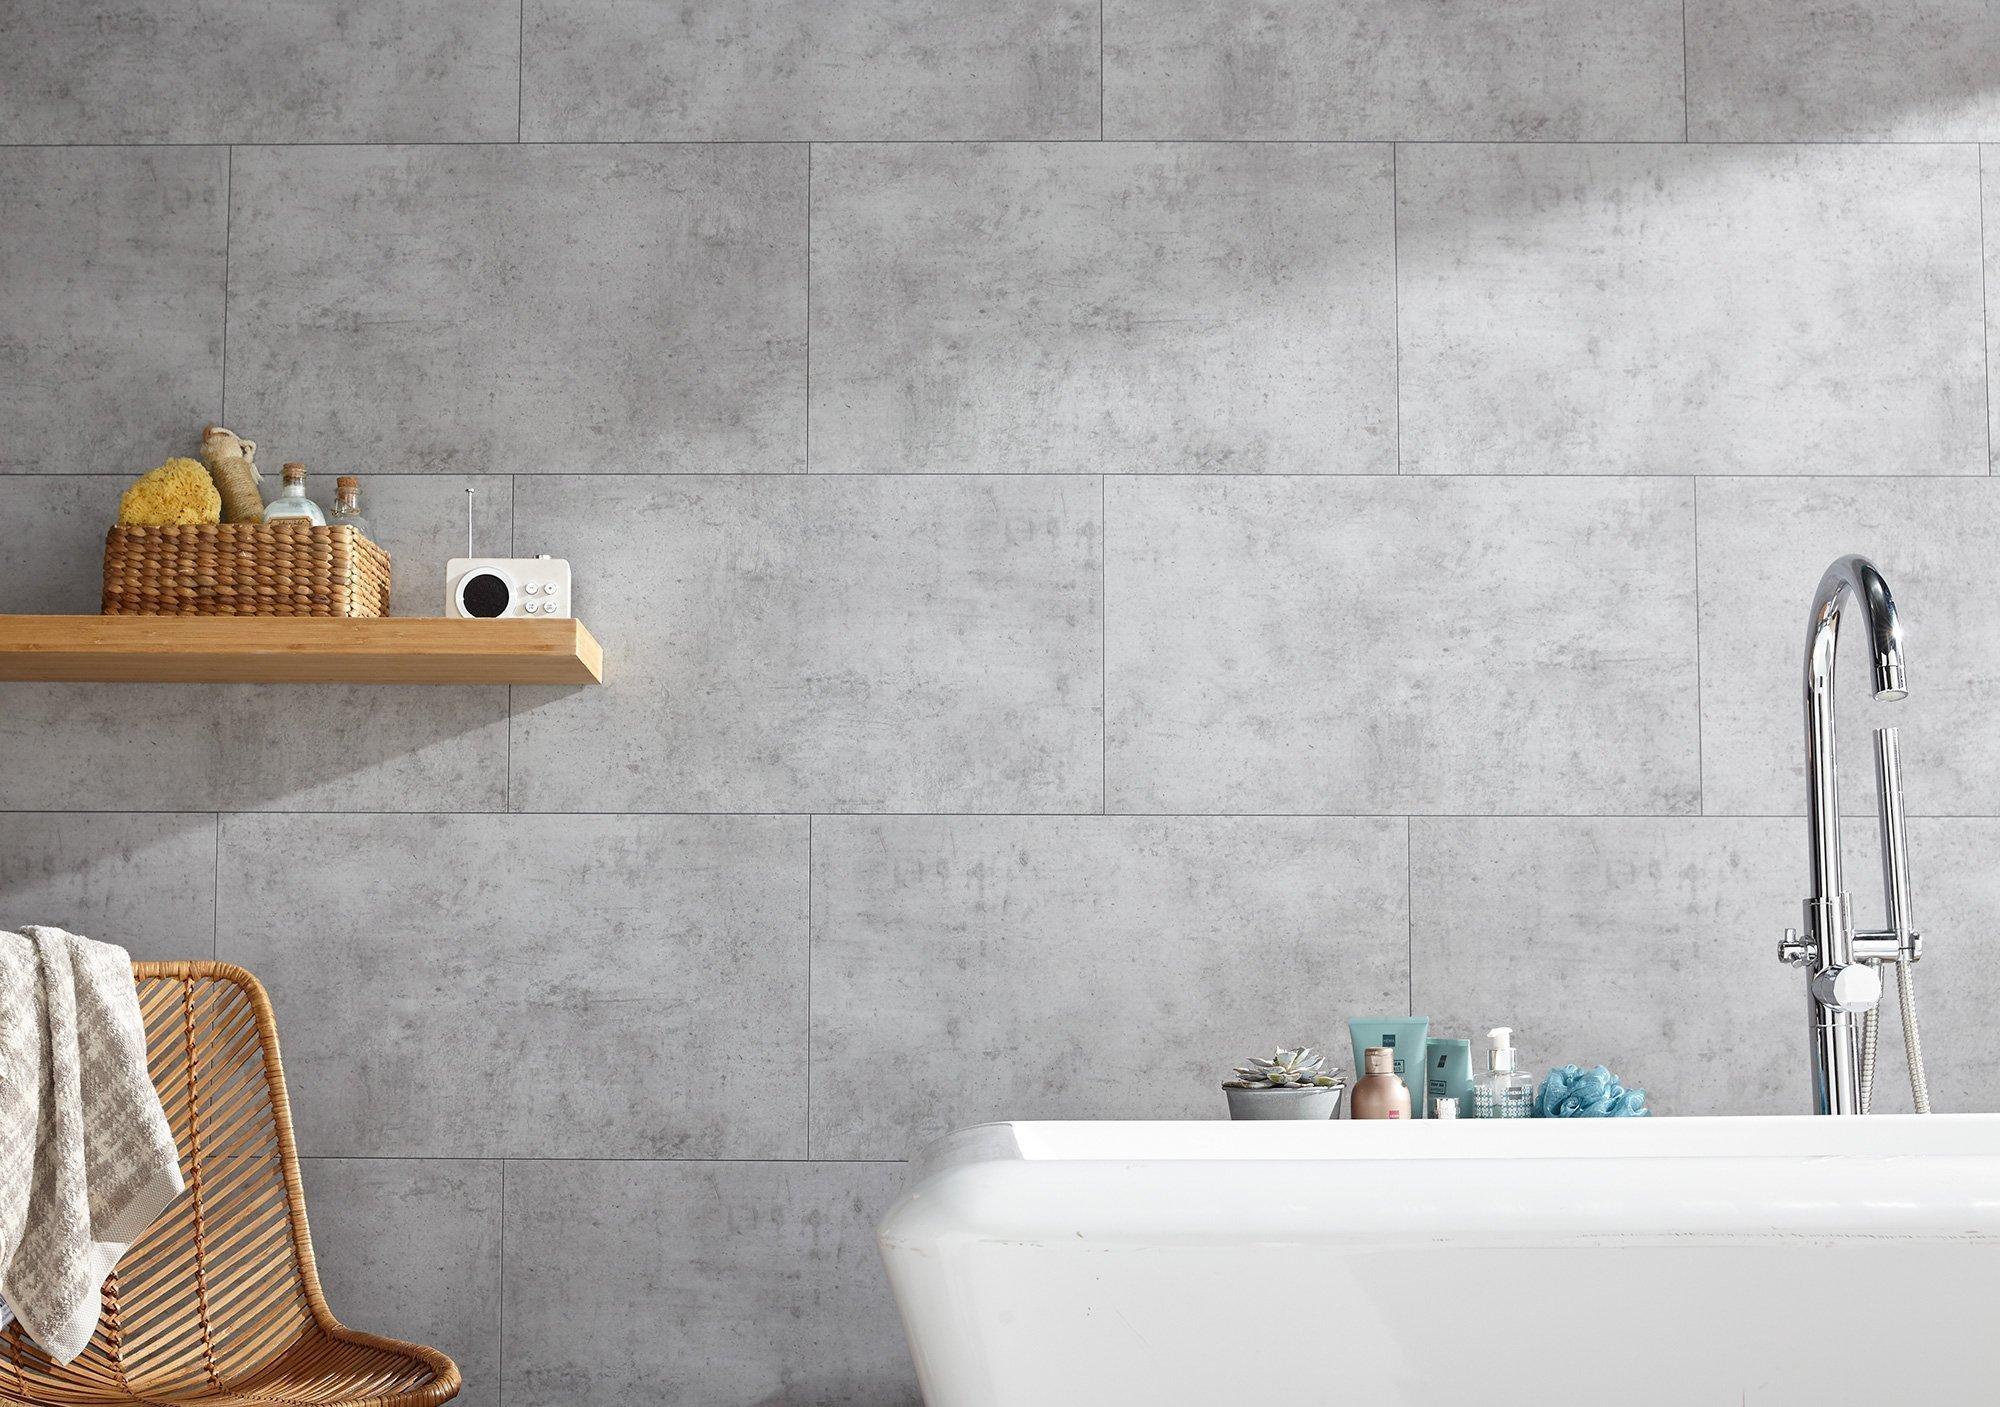 Dumawall Plus Tile Effect Cladding | Bathroom Cladding Direct